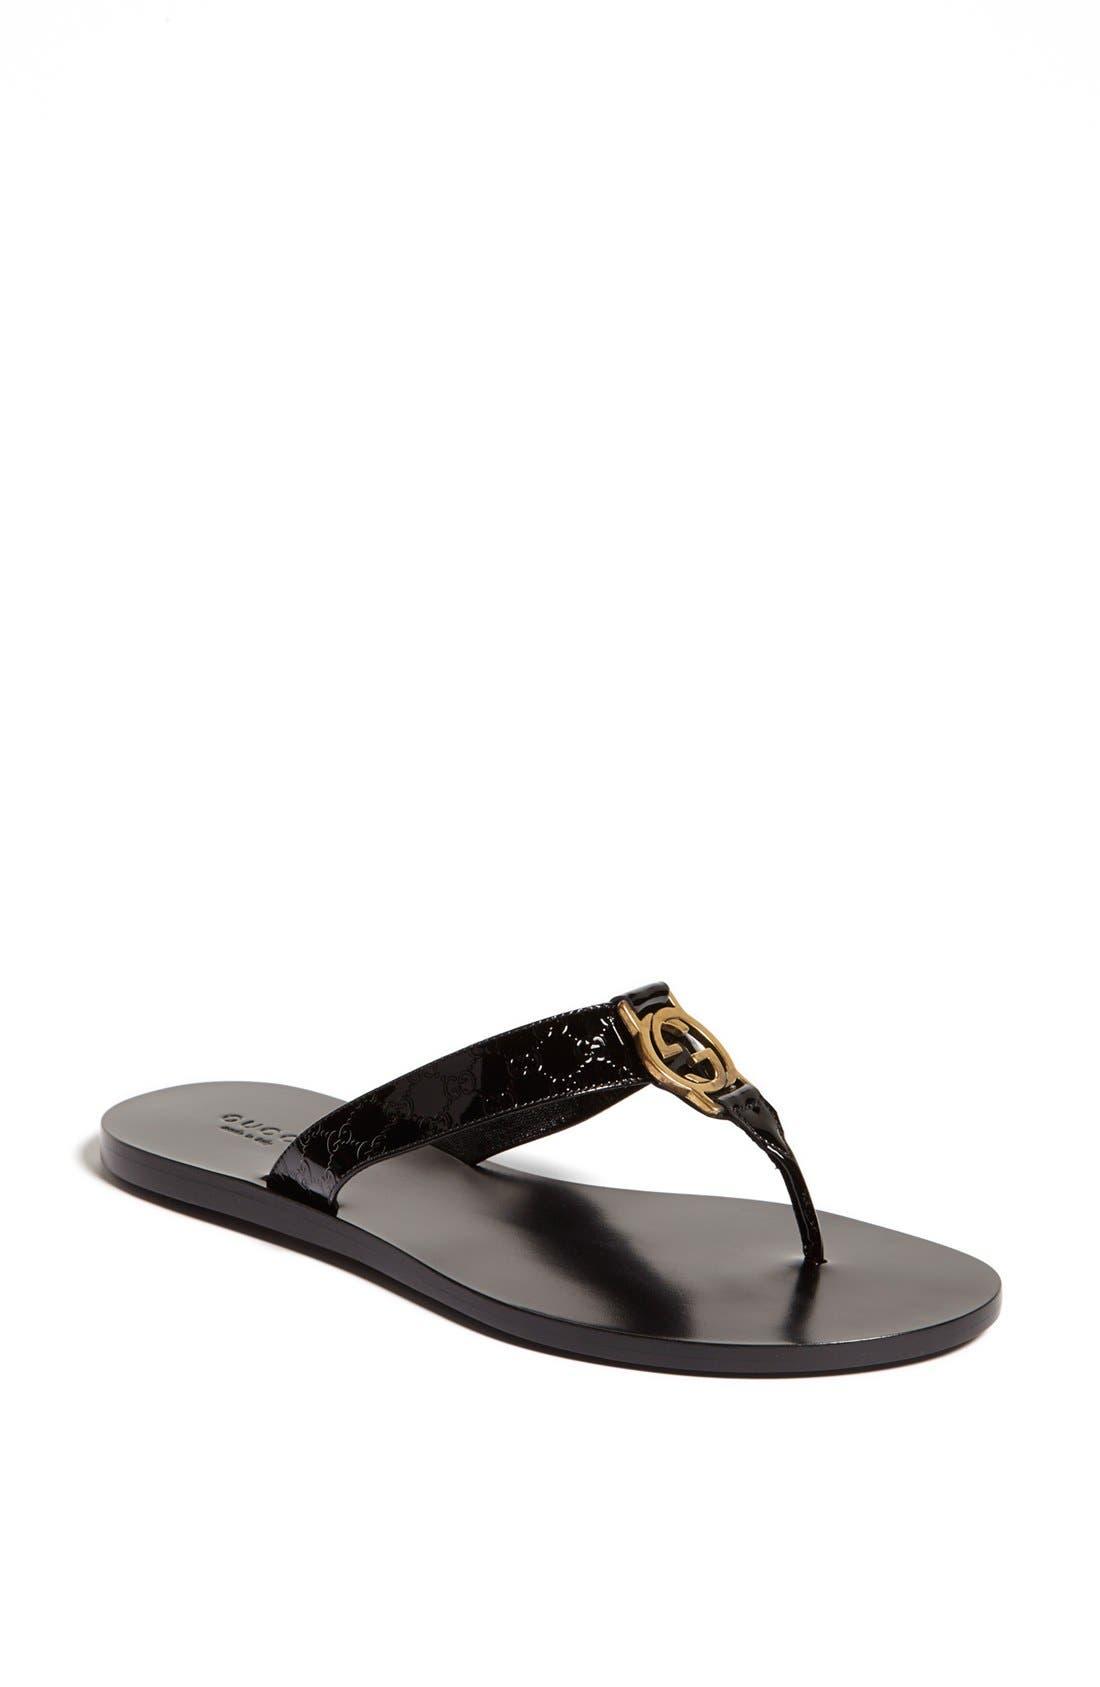 Gucci Thong Sandal | Nordstrom